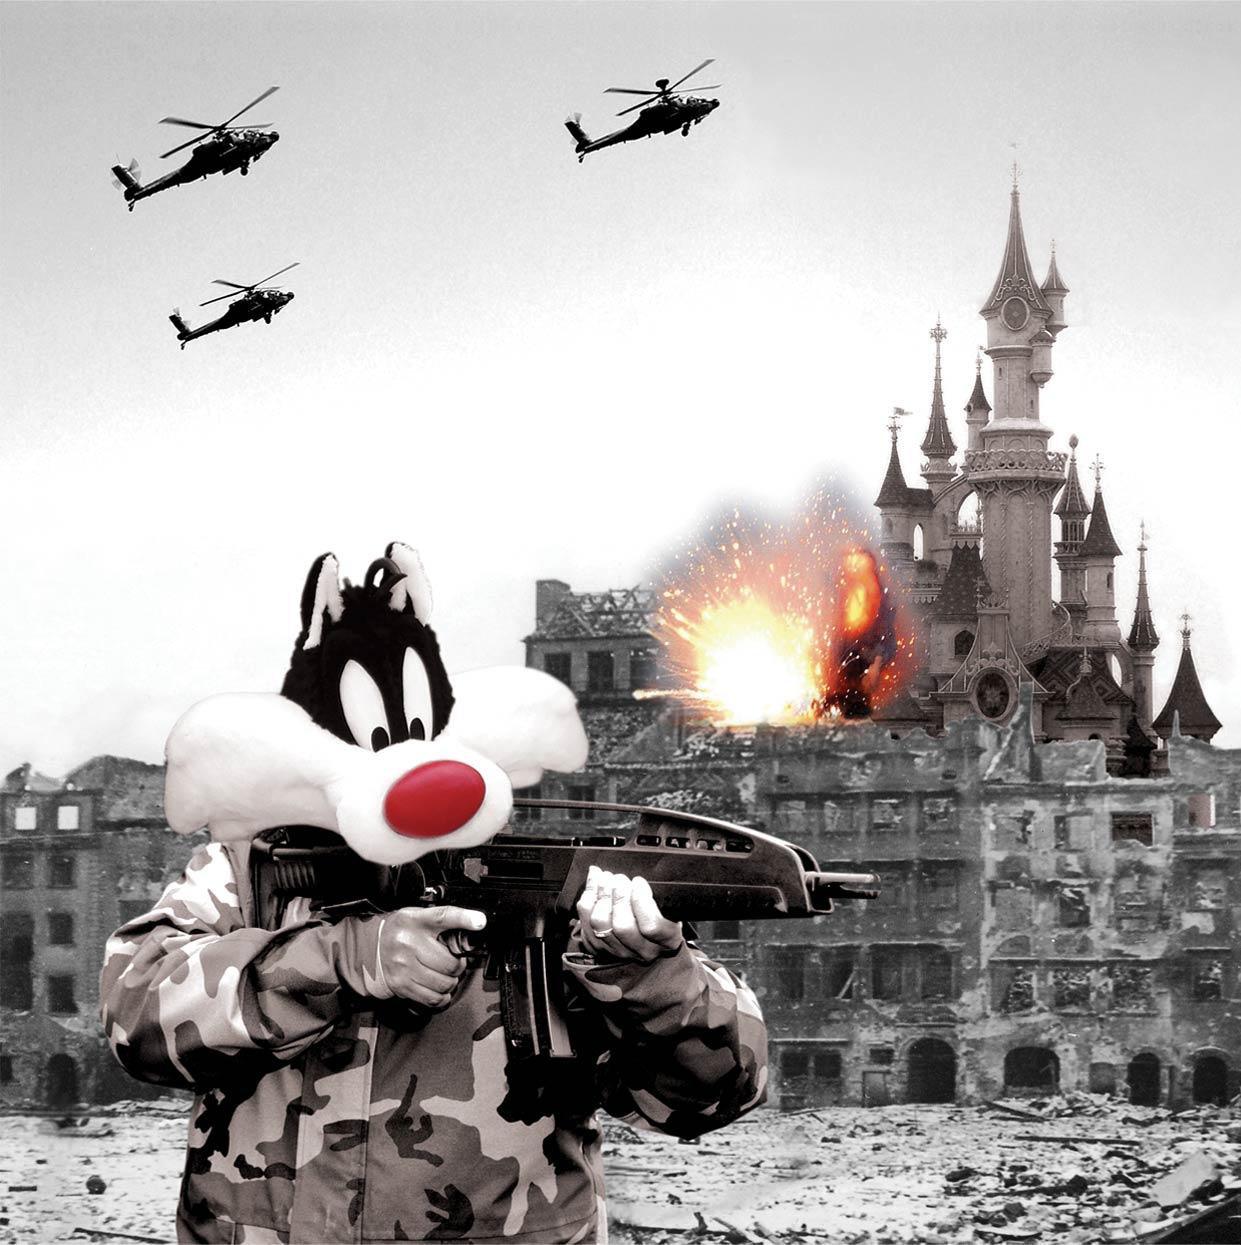 Disney under Attack - Max Papeschi